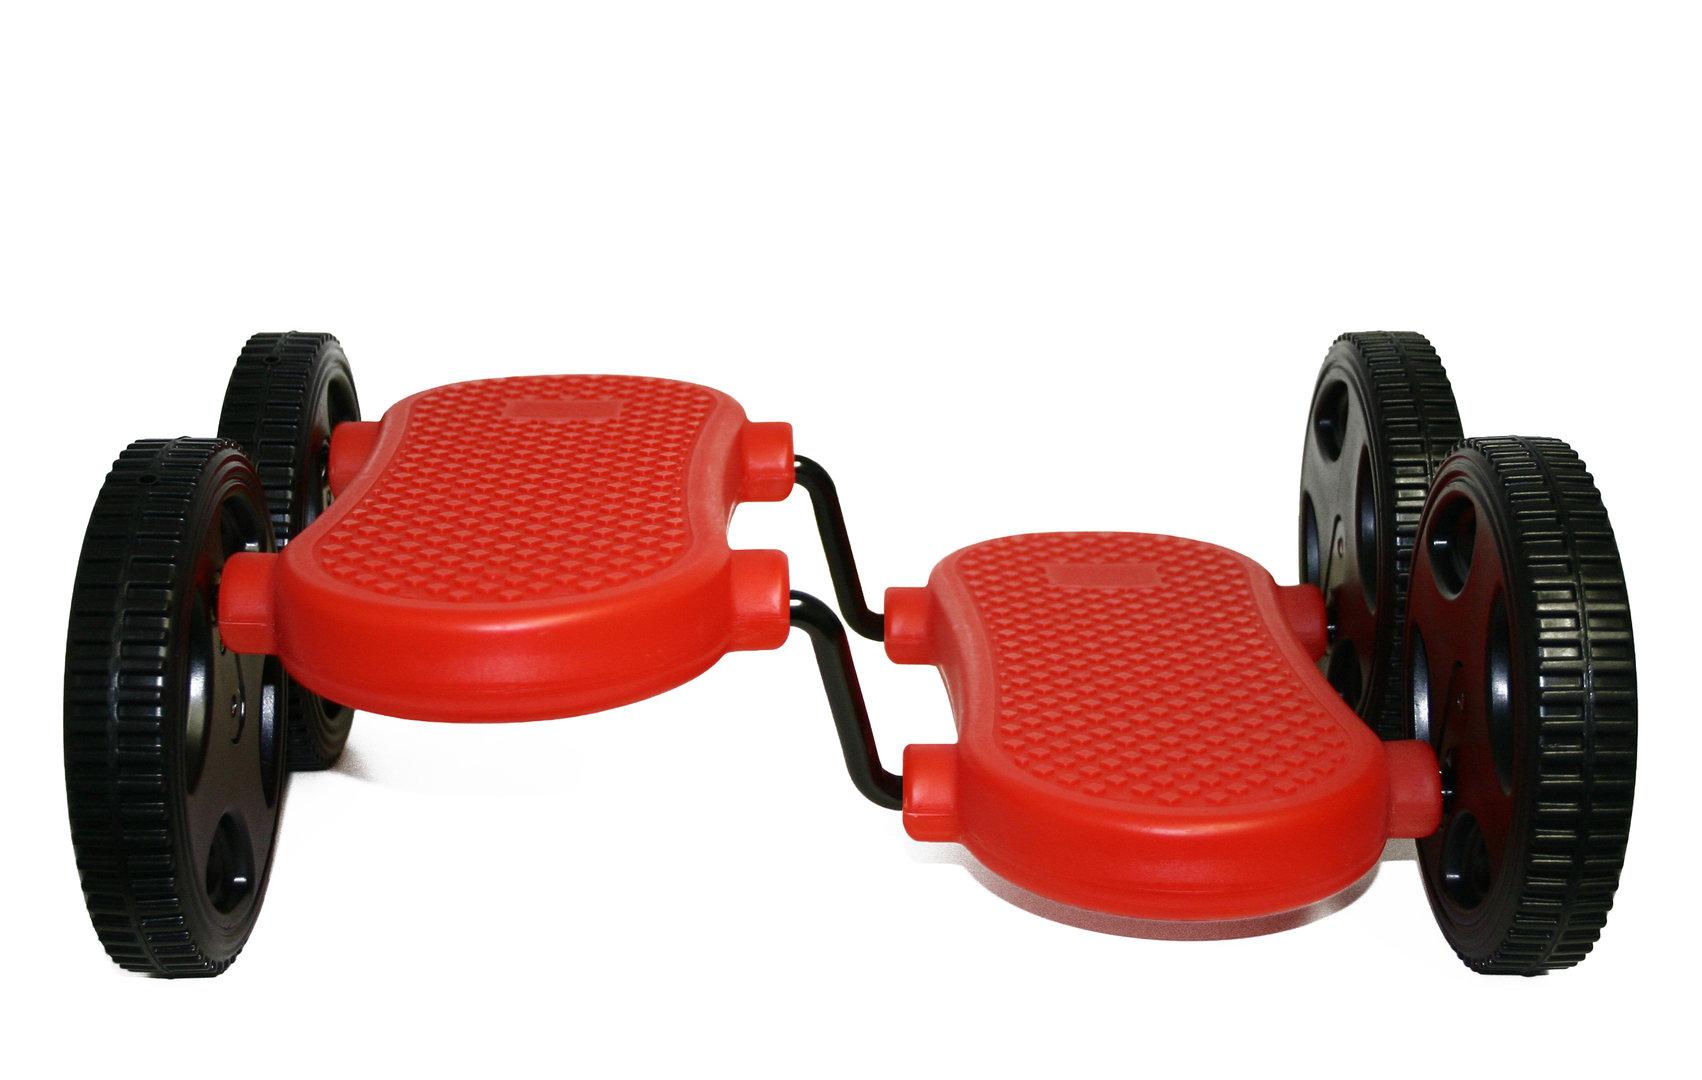 Pedalroller Rot